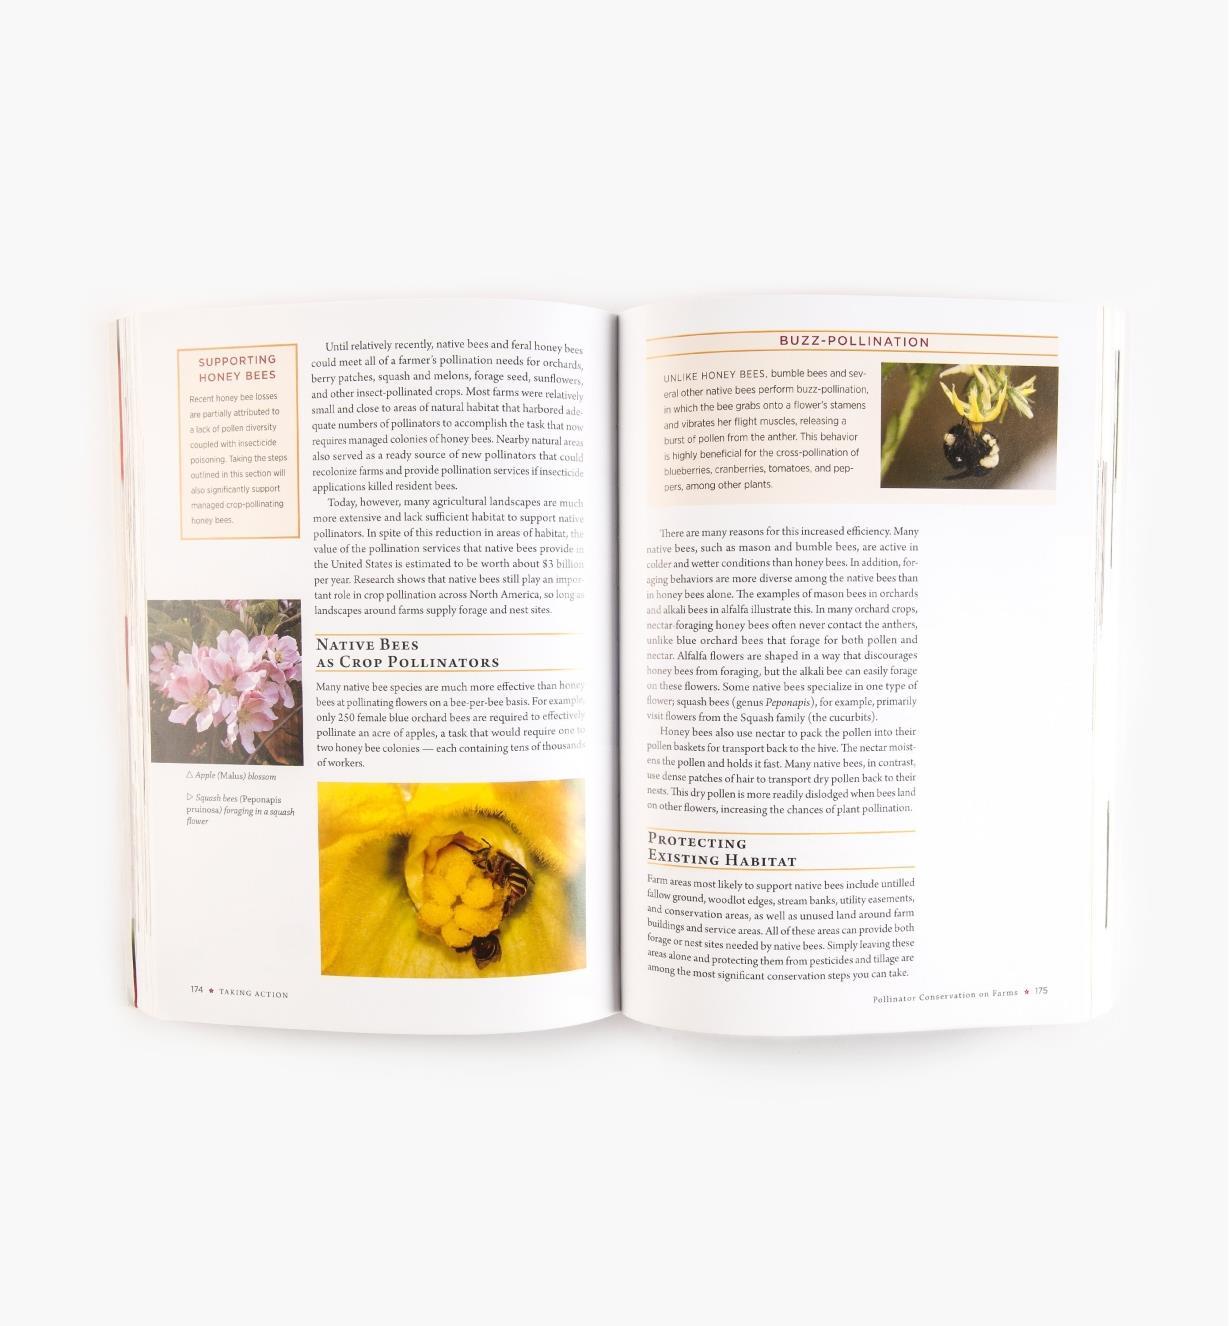 LA948 - Attracting Native Pollinators